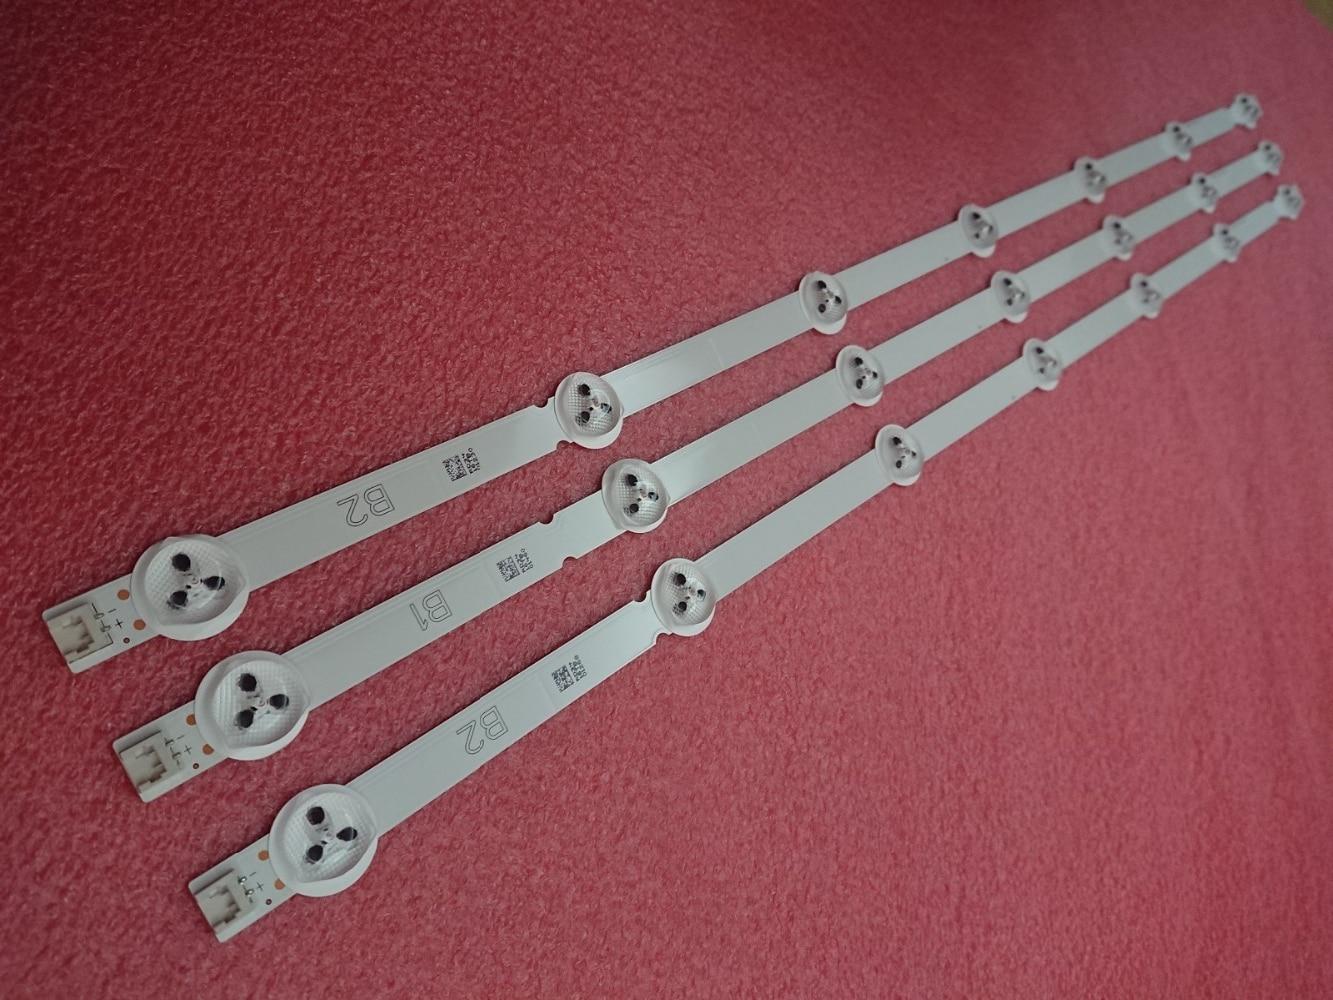 100% Baru 3 PCS / set LED Backlight Strip sempurna kompatibel untuk - Permainan dan aksesoris - Foto 4